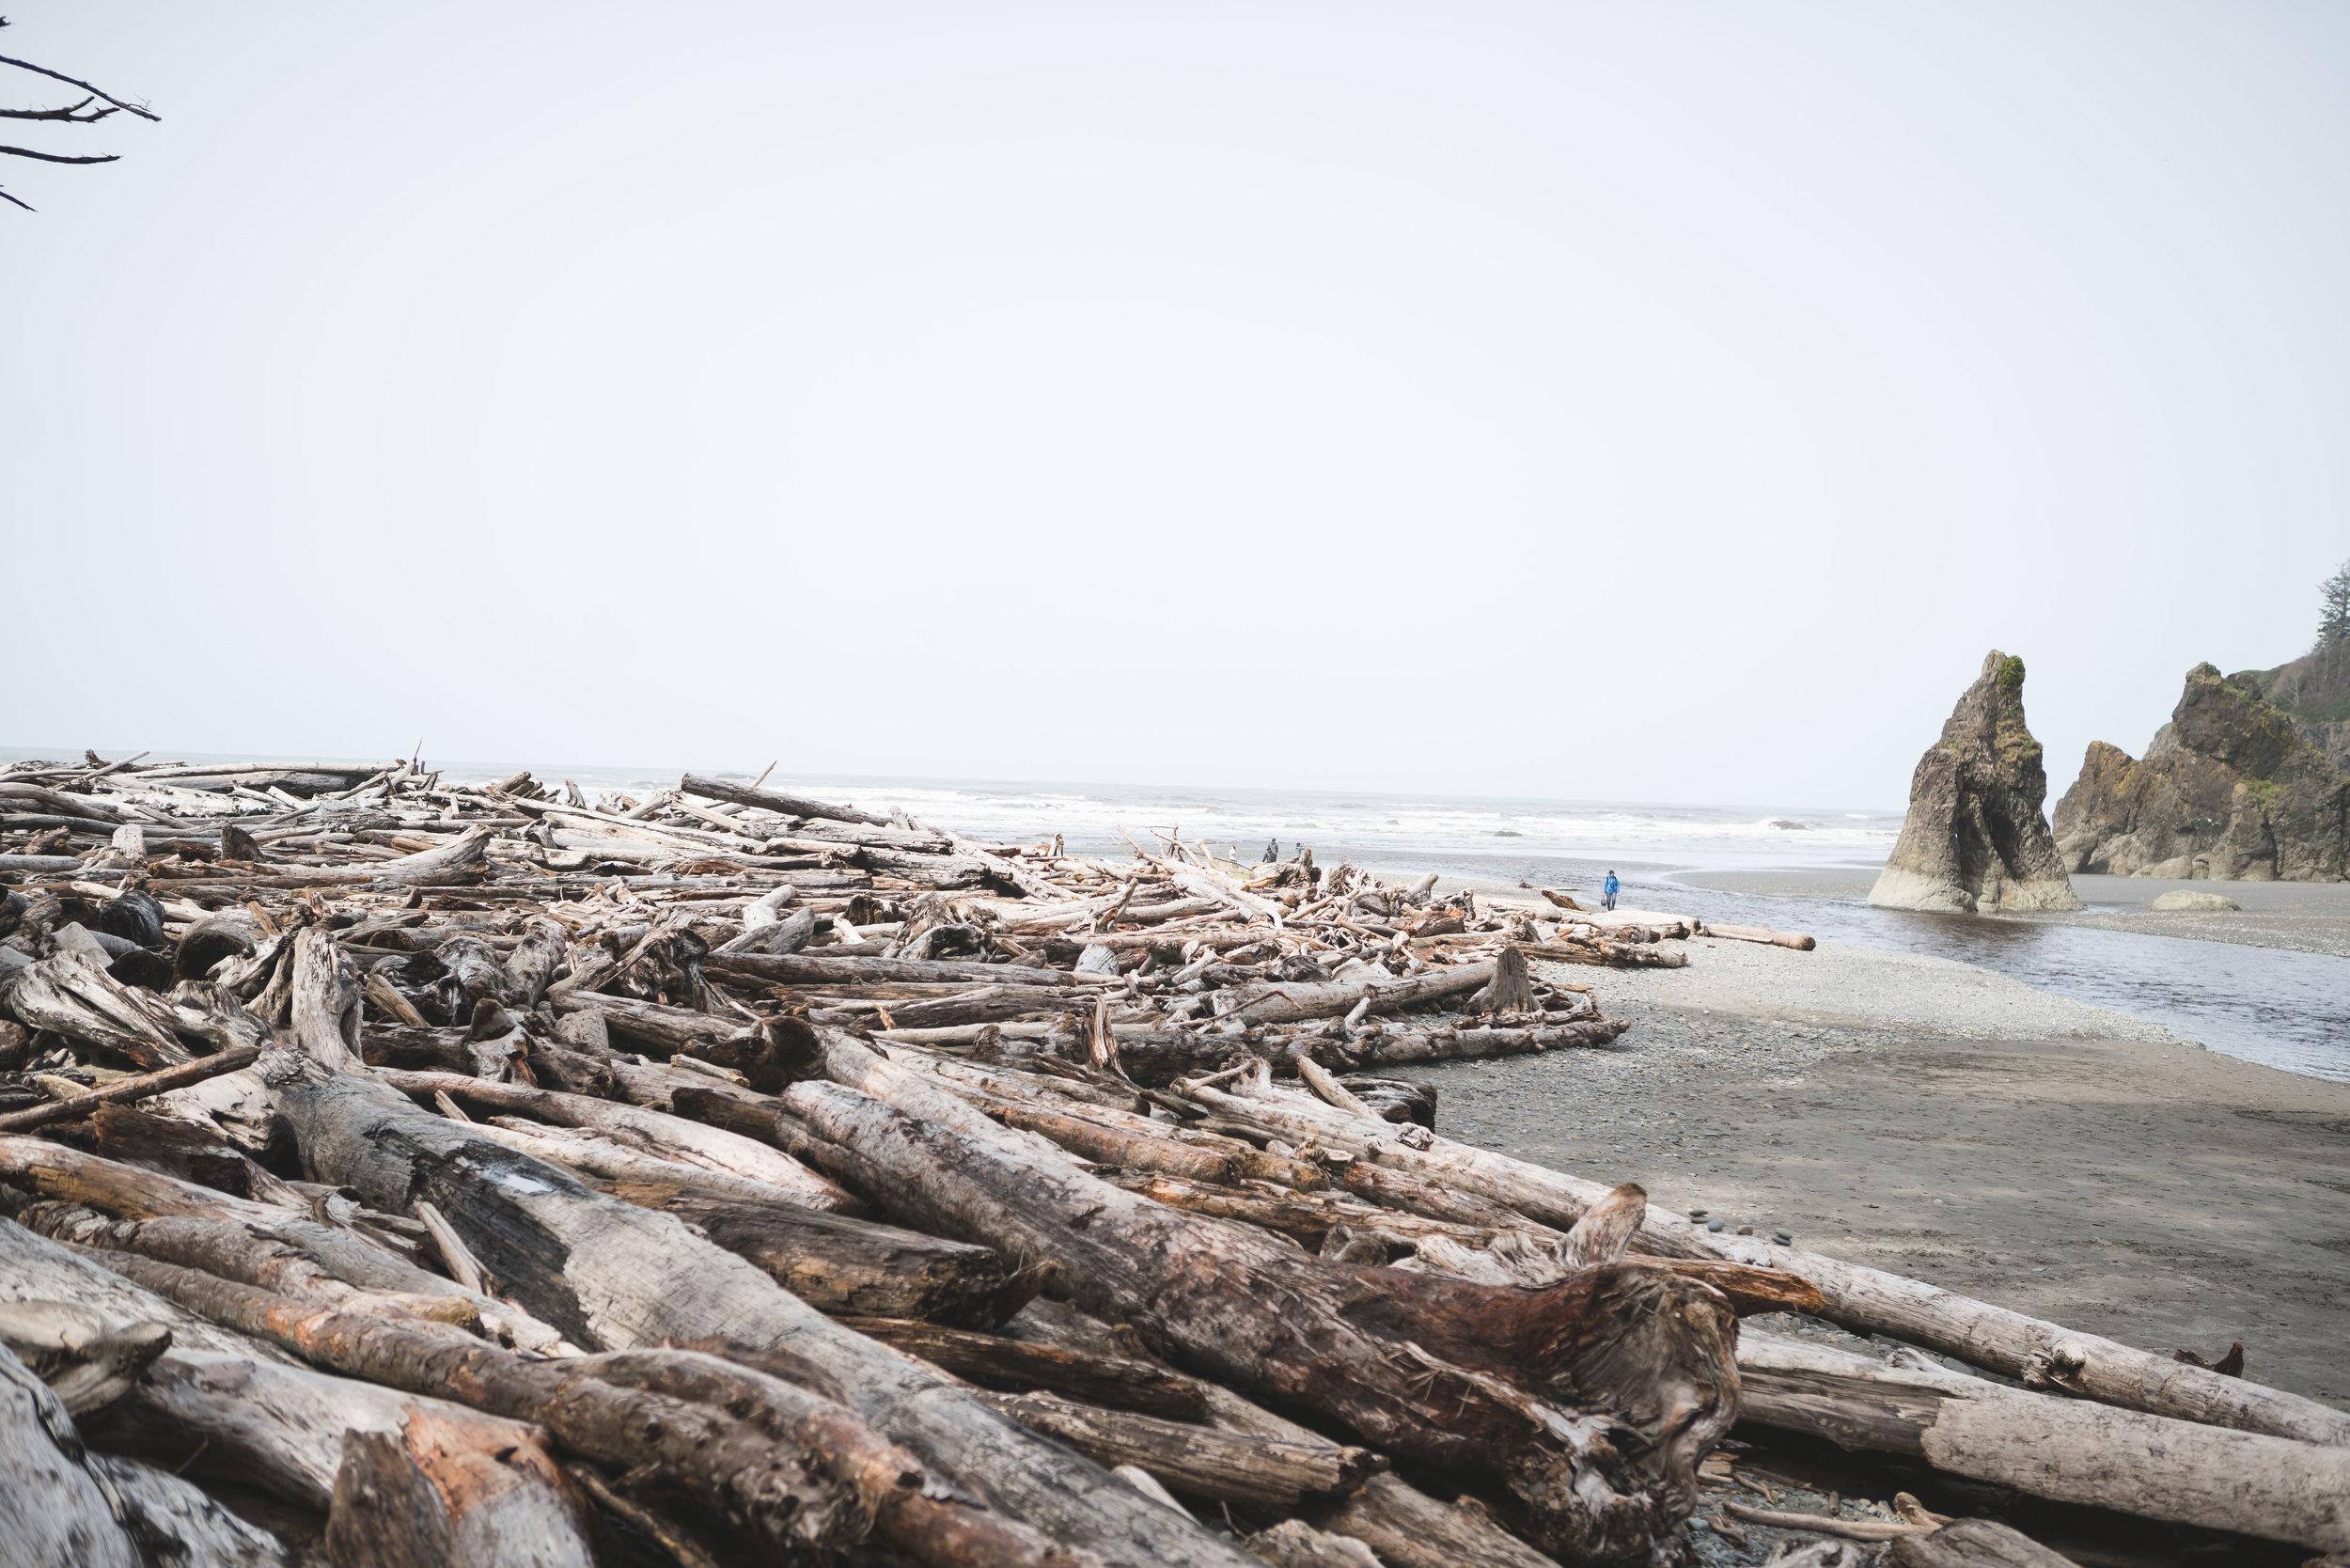 Olympic National Park Beach Logs Coast Oregon Road Trip Colorado to Alaska